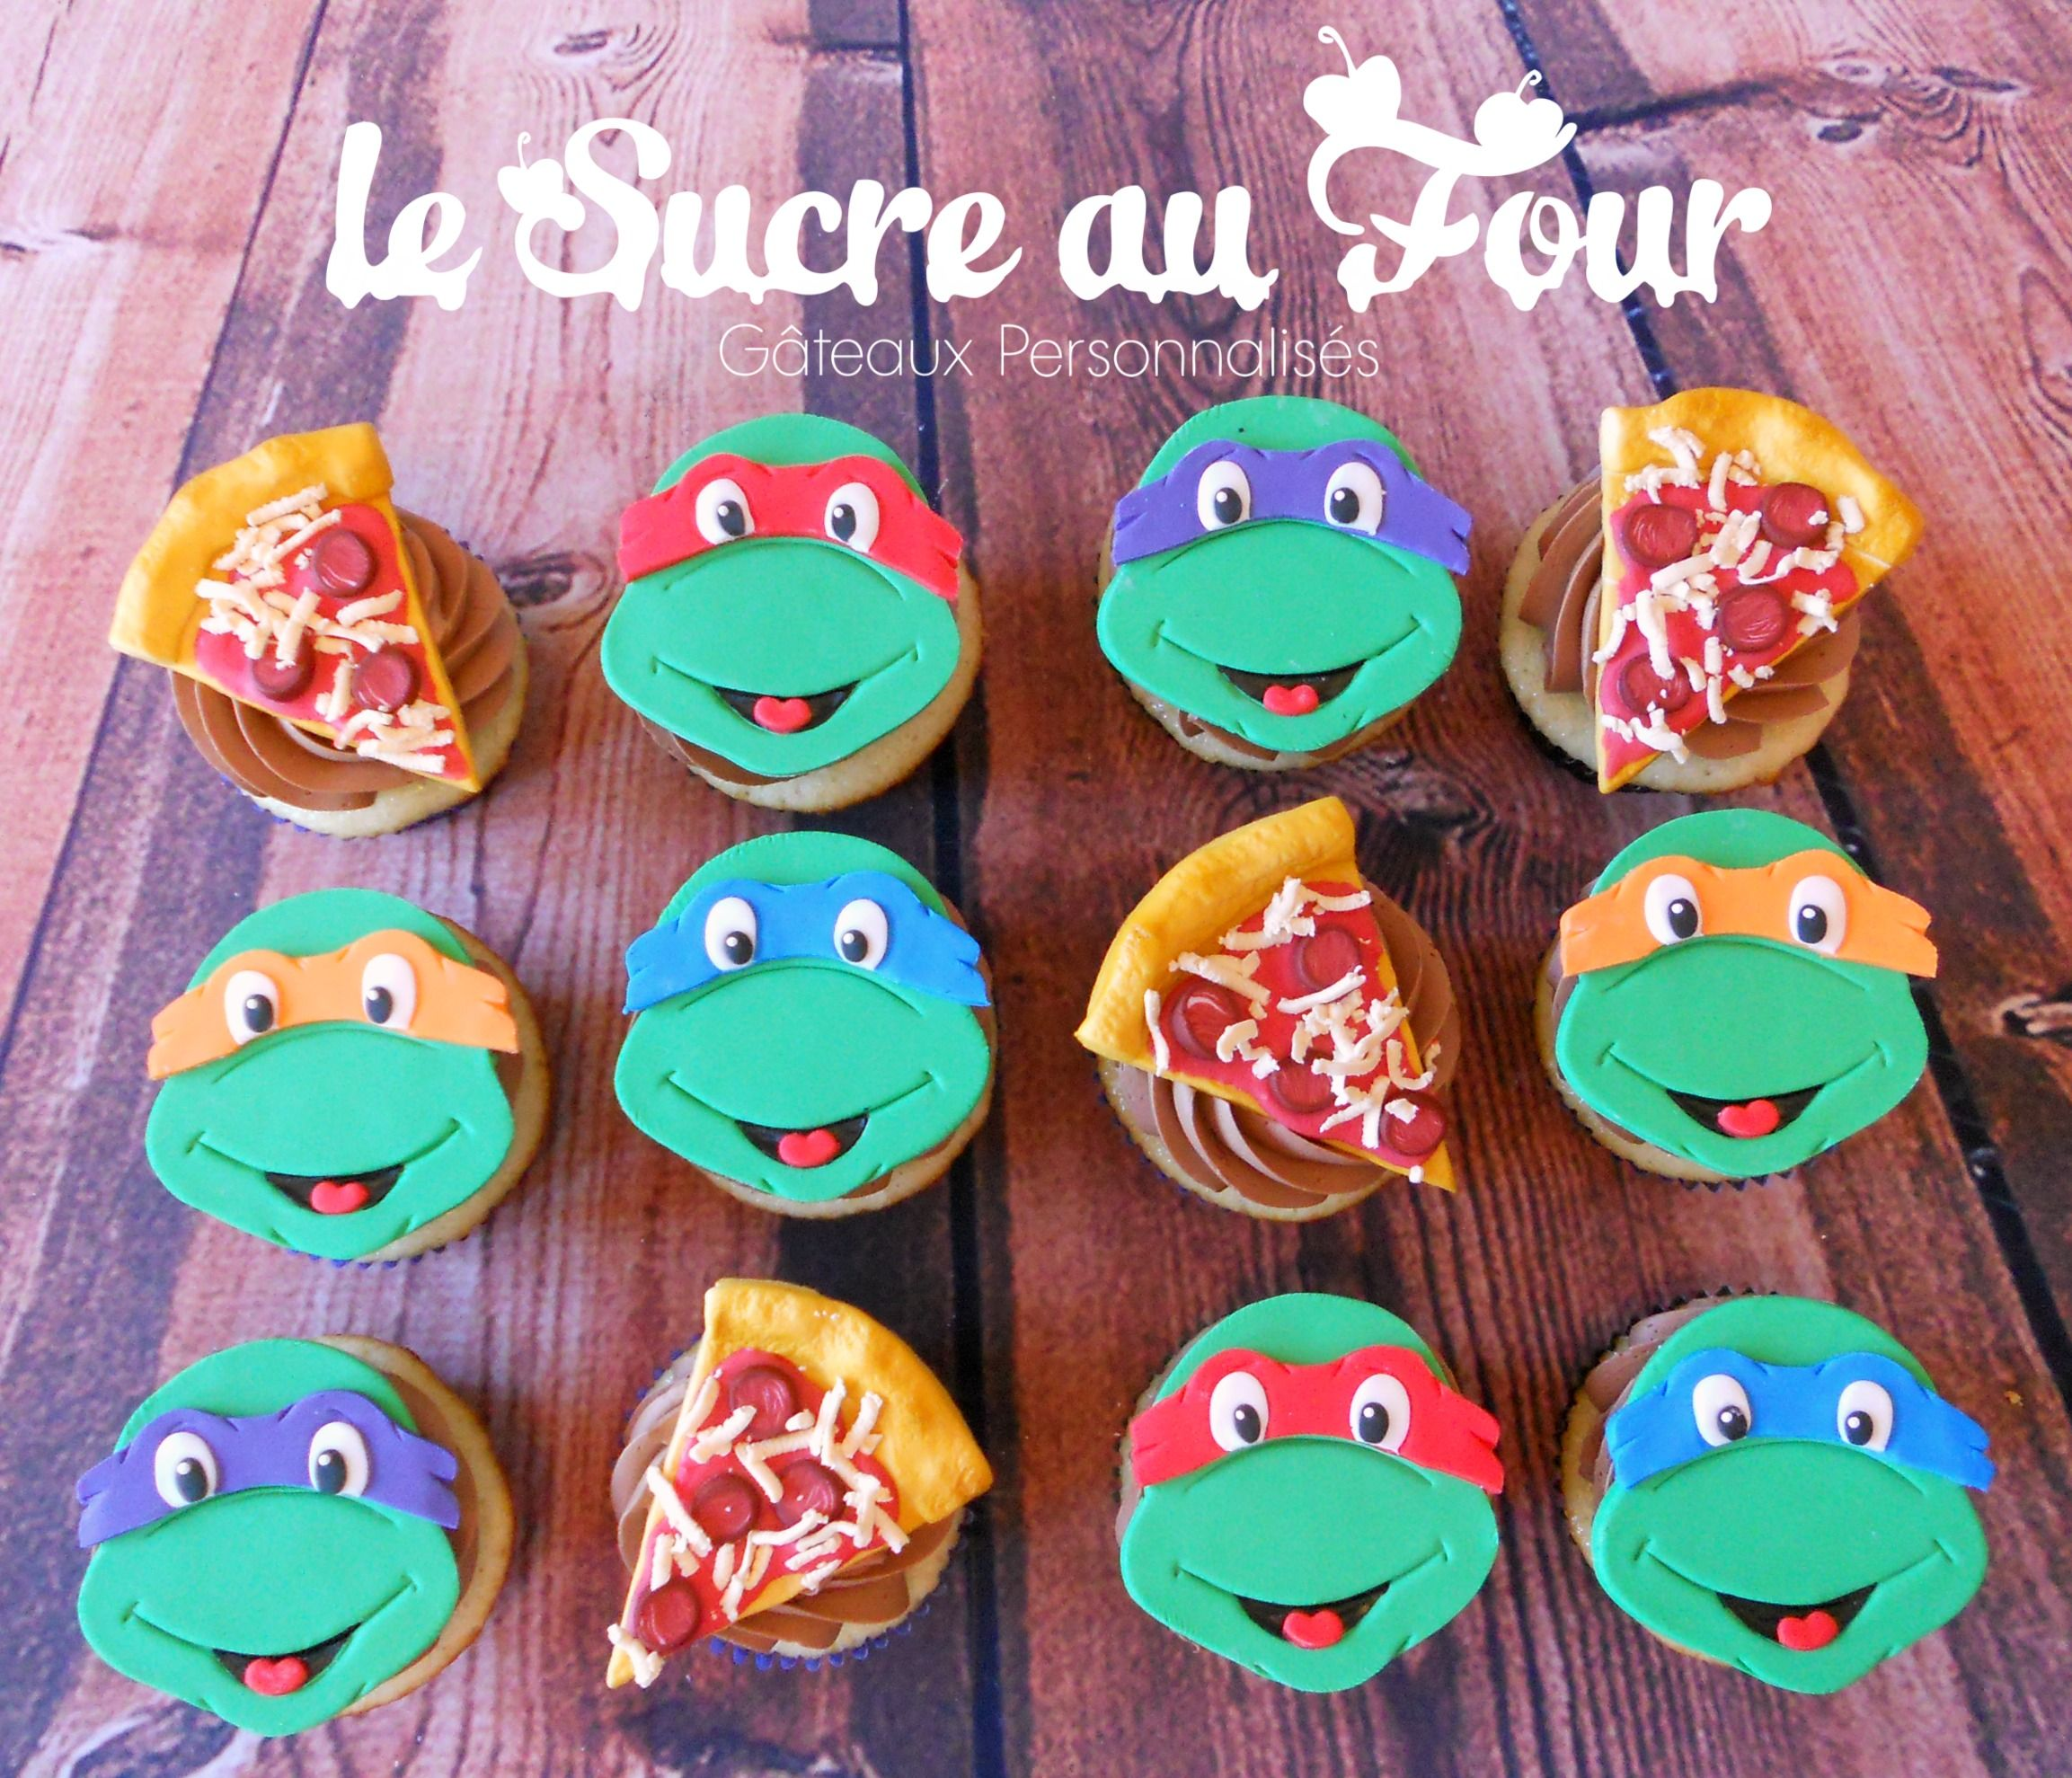 Ninja Turtles Cupcakes And Slice Of Pizza Cupcake Toppers Ninja Turtle Cupcakes Turtle Cupcakes Pizza Cupcakes